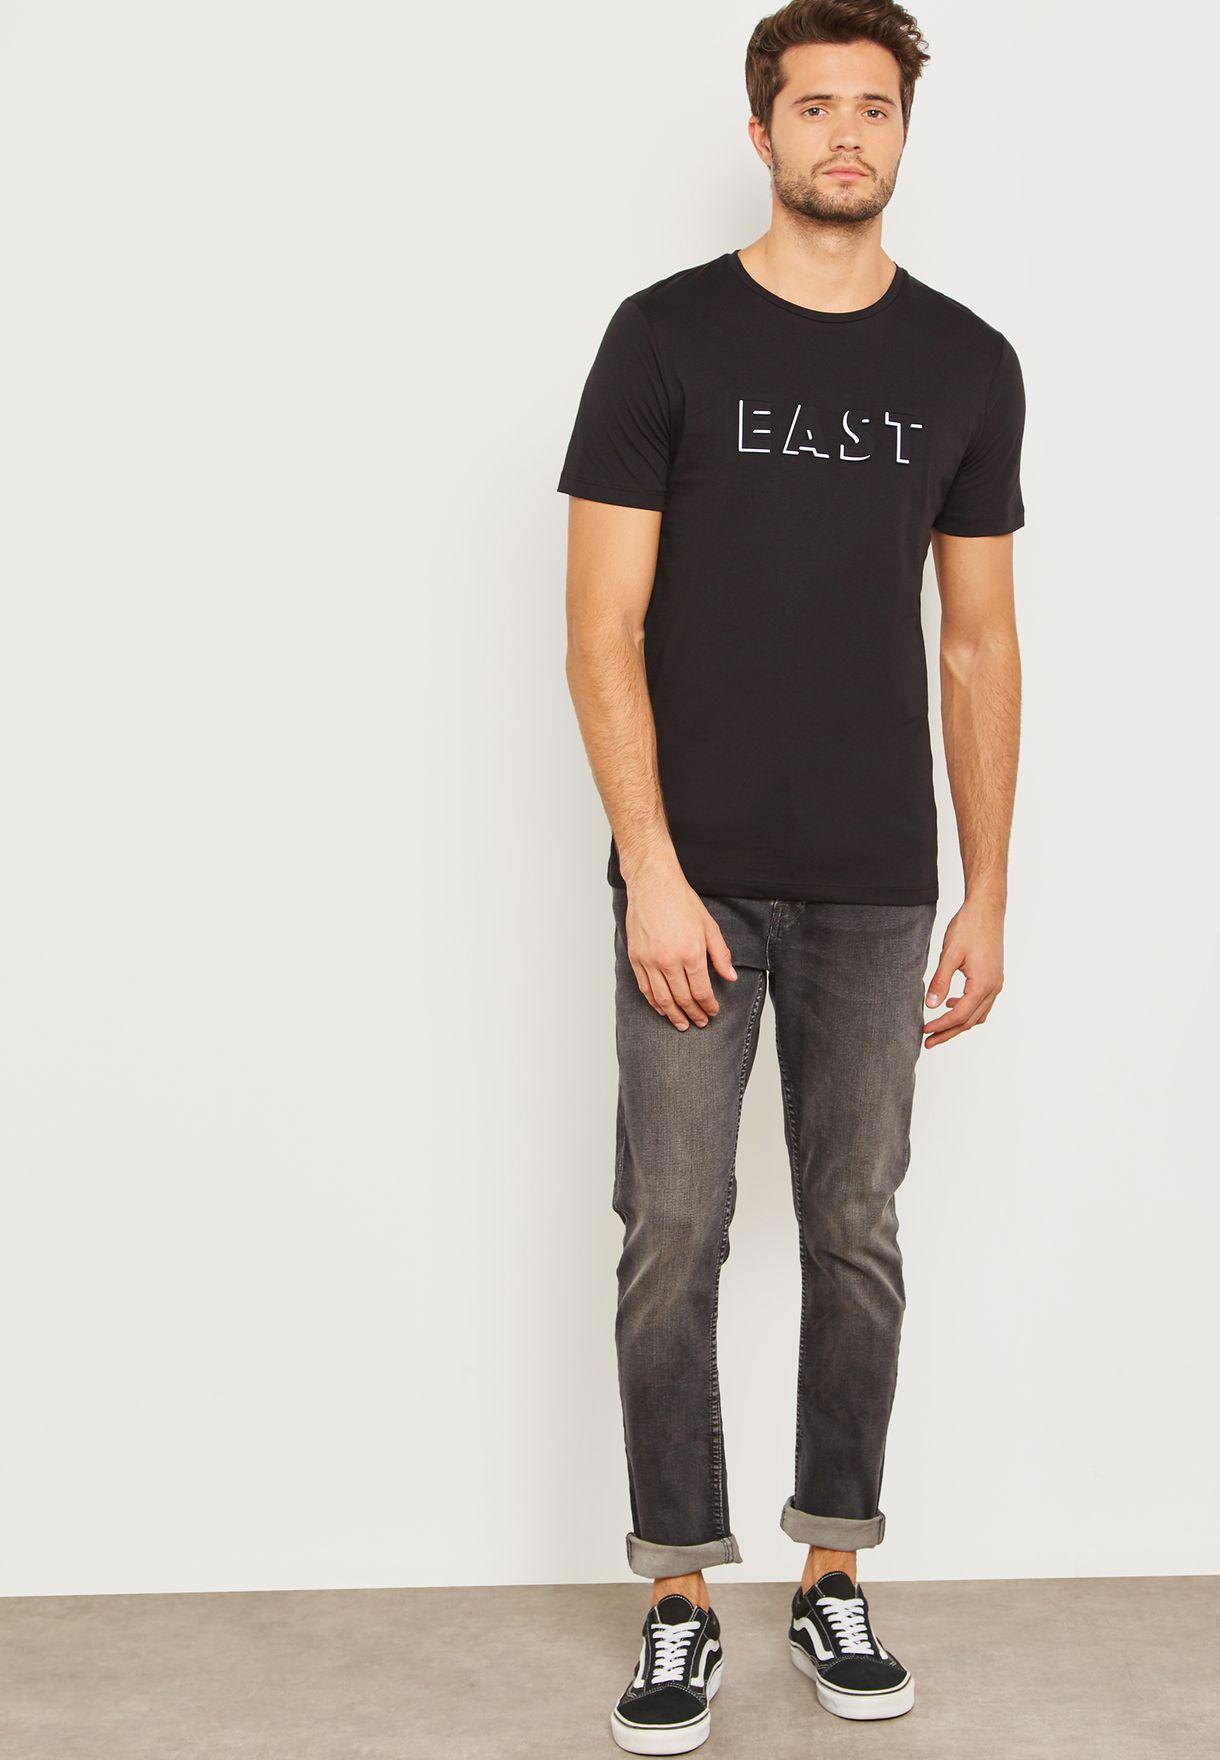 Douglas Crew Neck T-Shirt